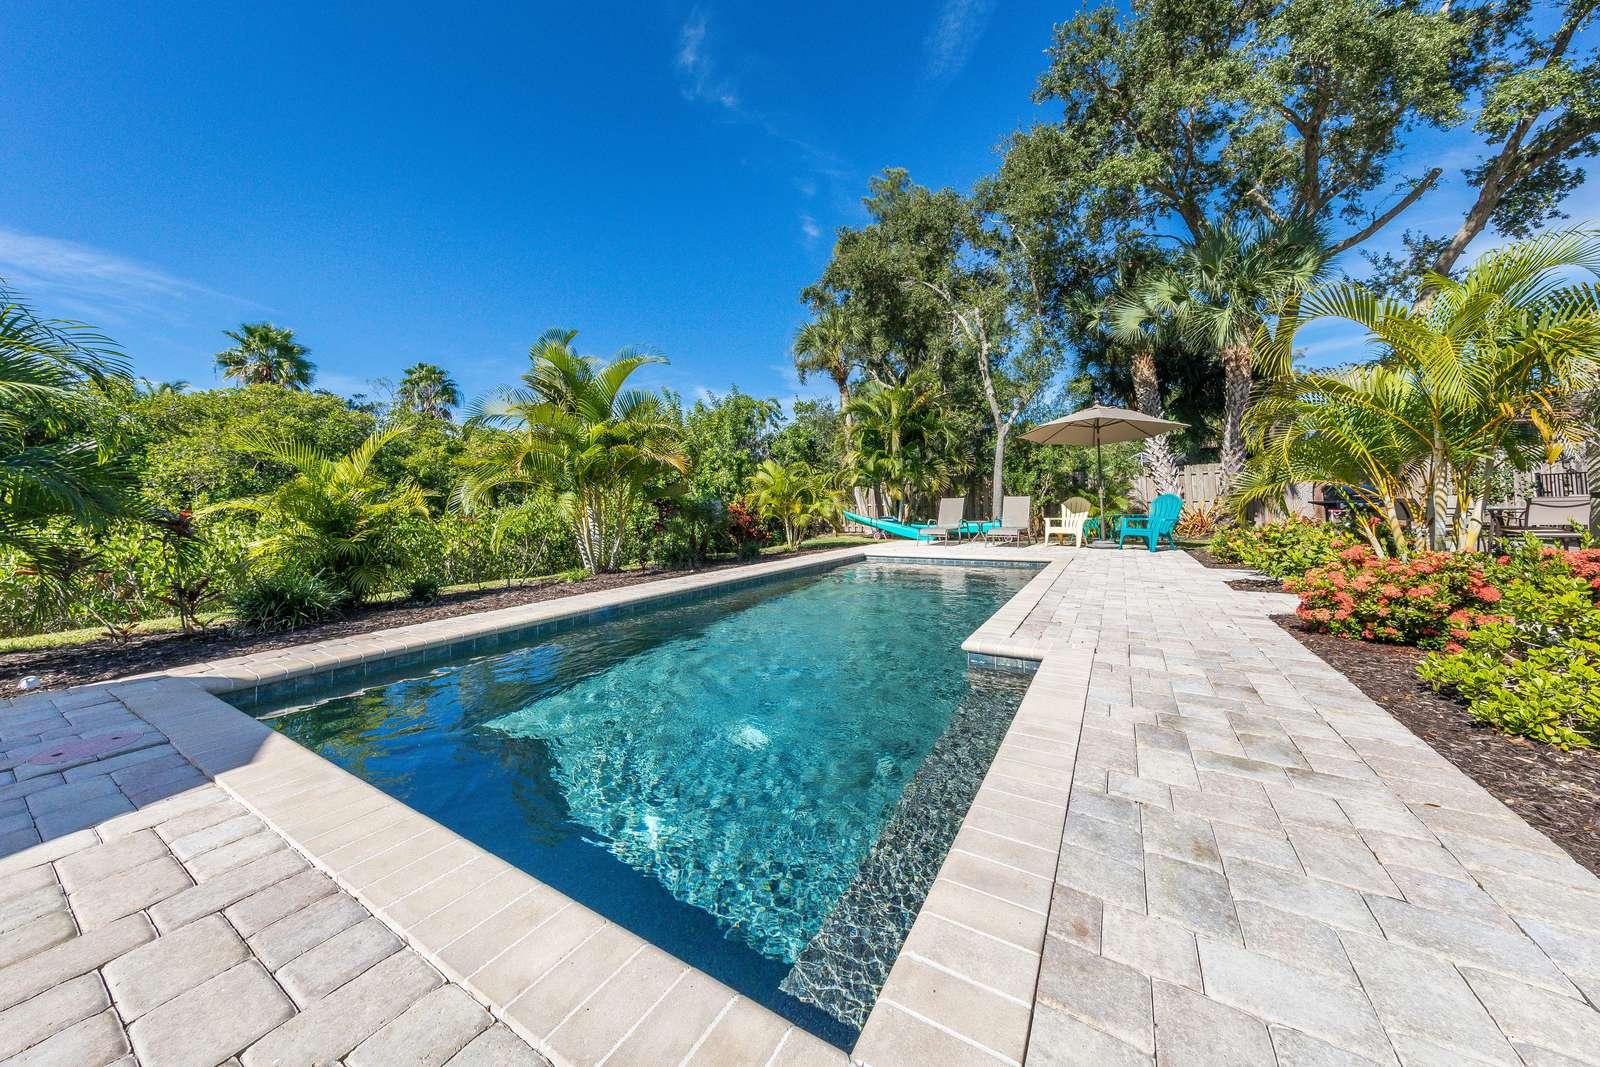 CocoBayou Cottage - property